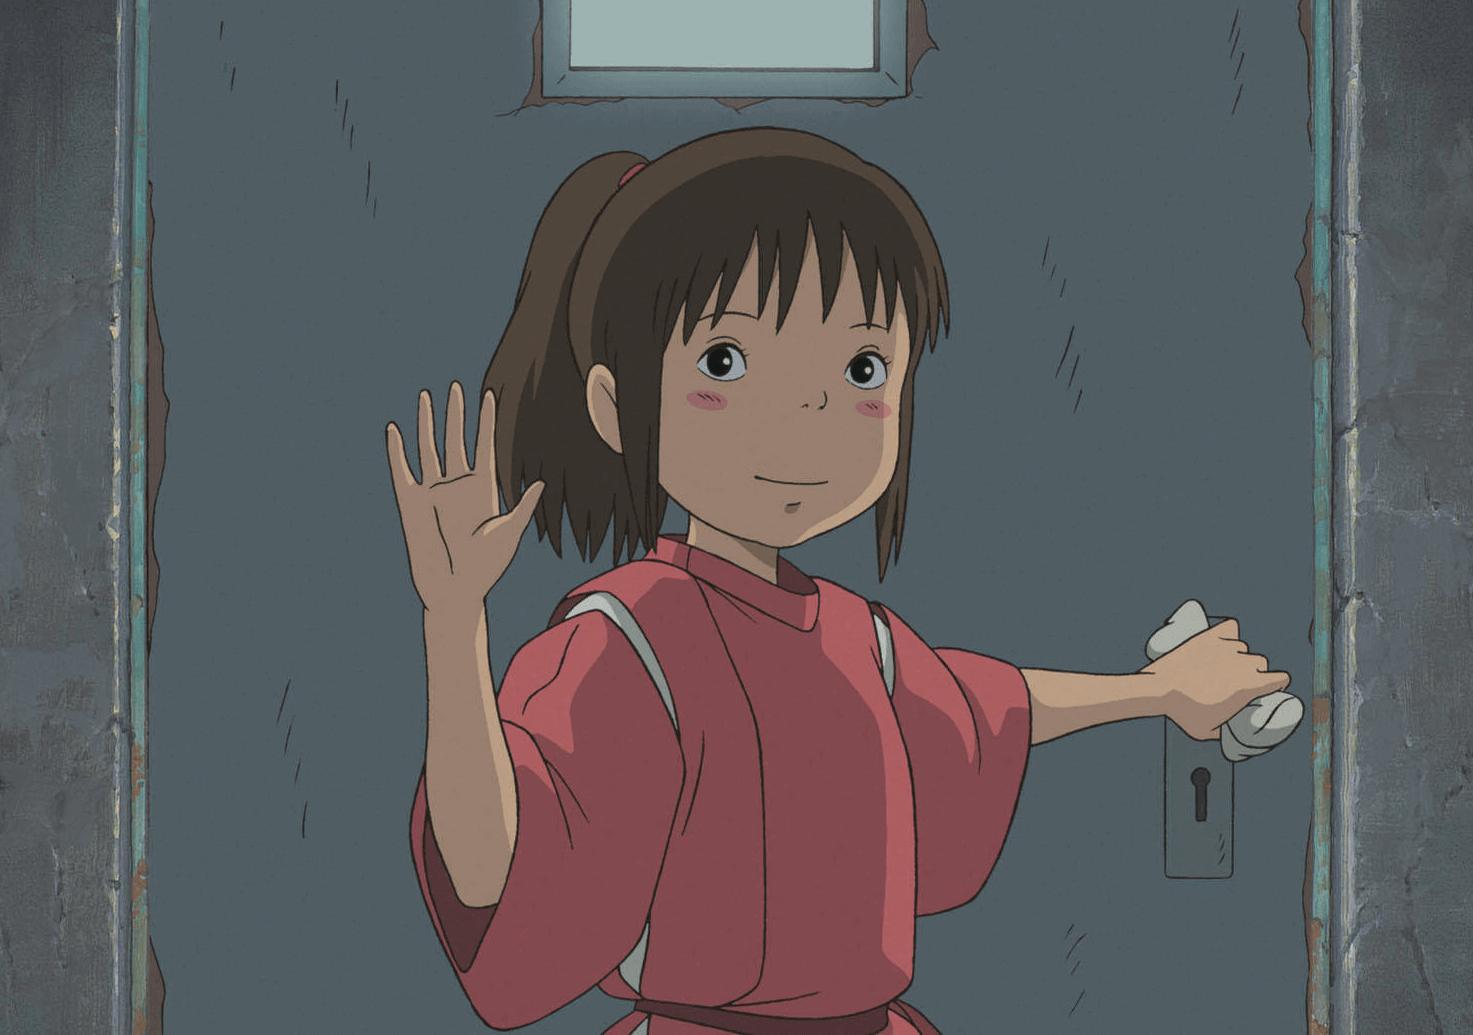 Miyazaki Hayao & Studio Ghibli